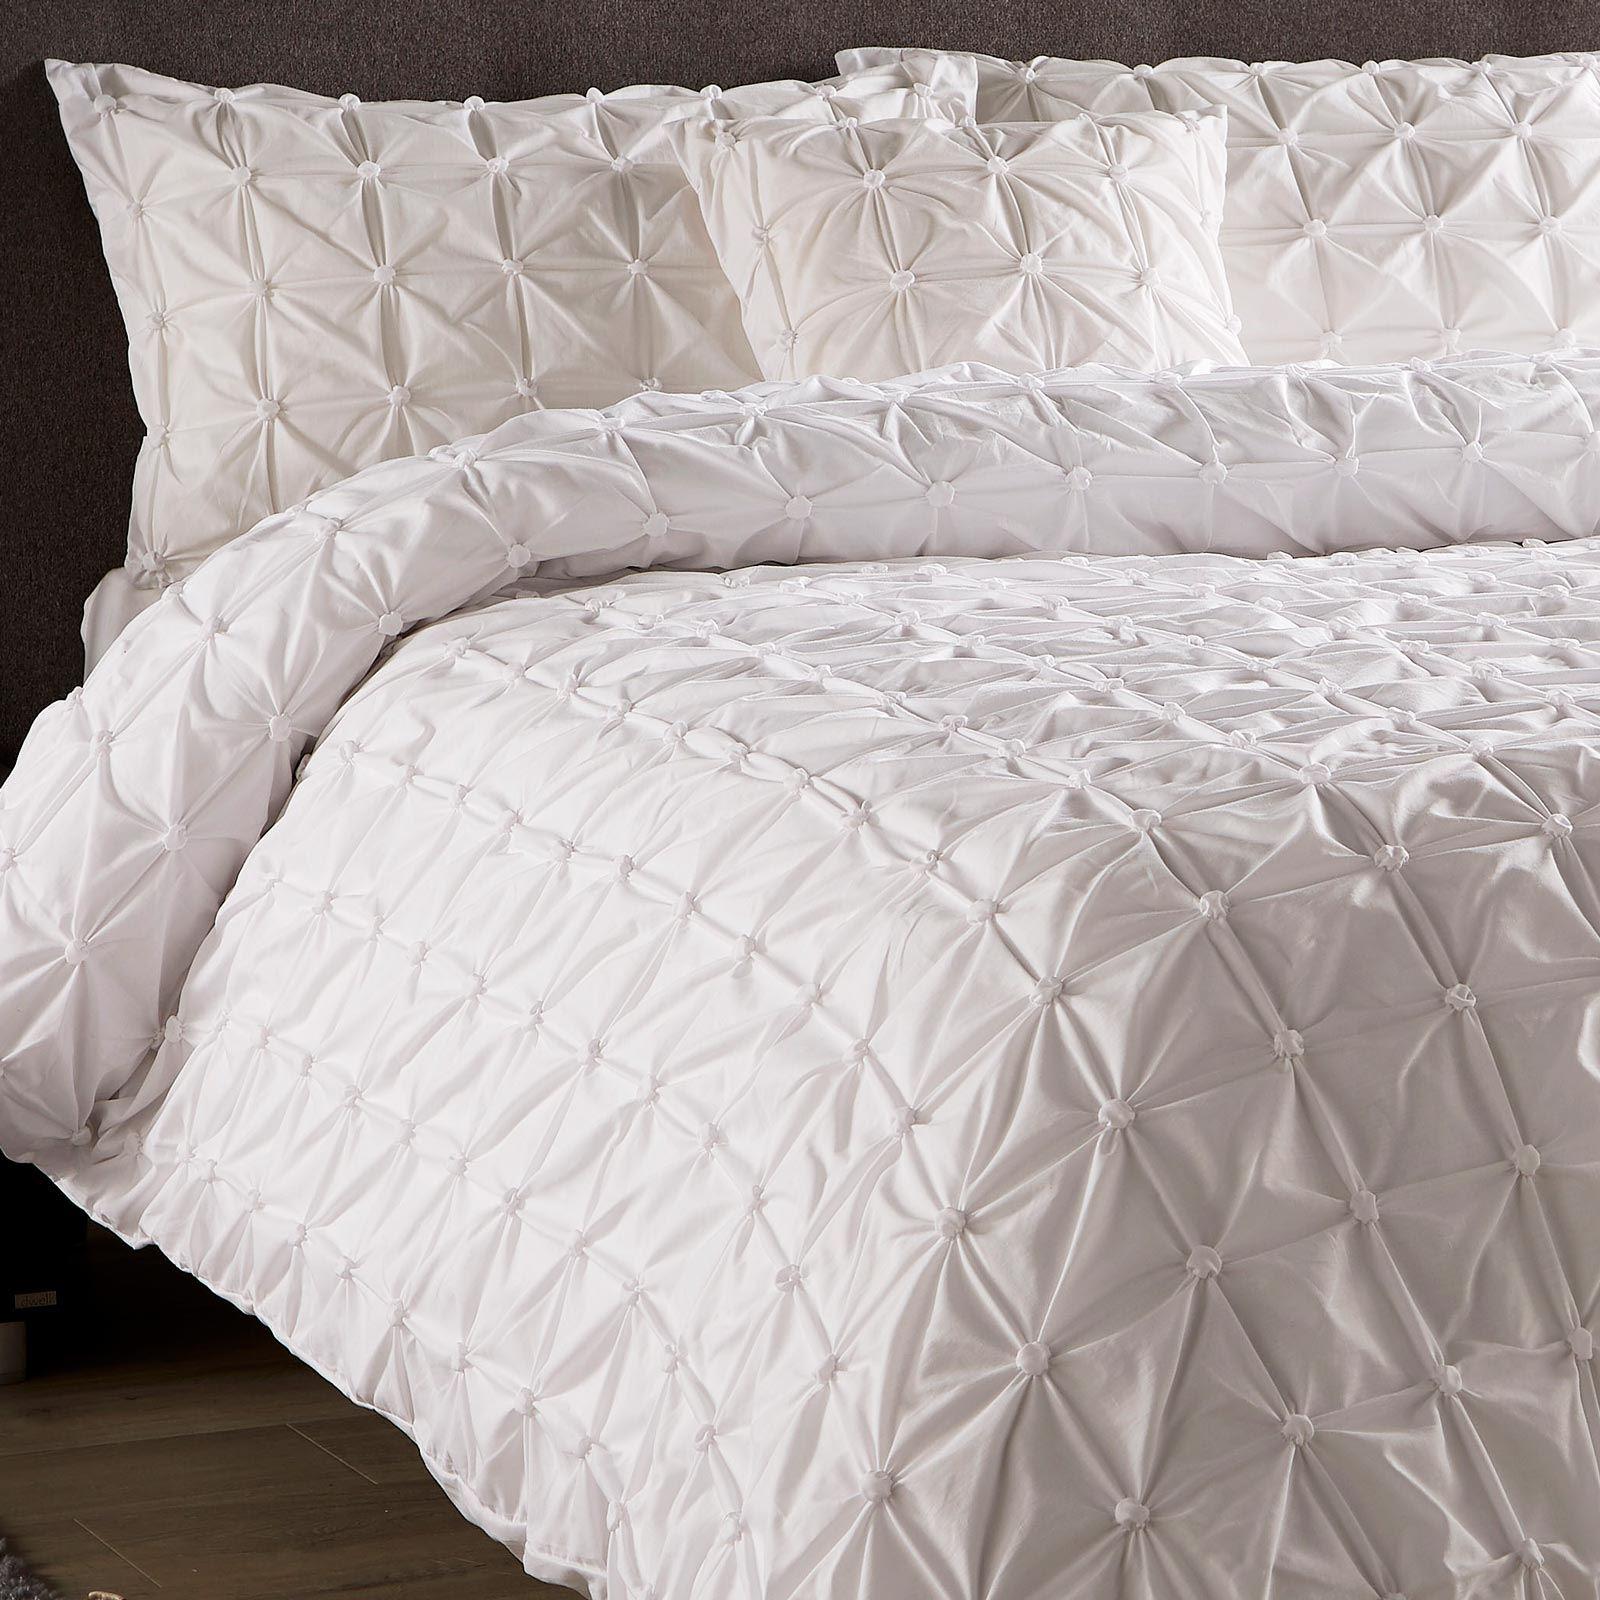 Pleated-Duvet-Covers-Seville-Pintuck-Luxury-Cotton-Rich-Quilt-Bedding-Sets thumbnail 12